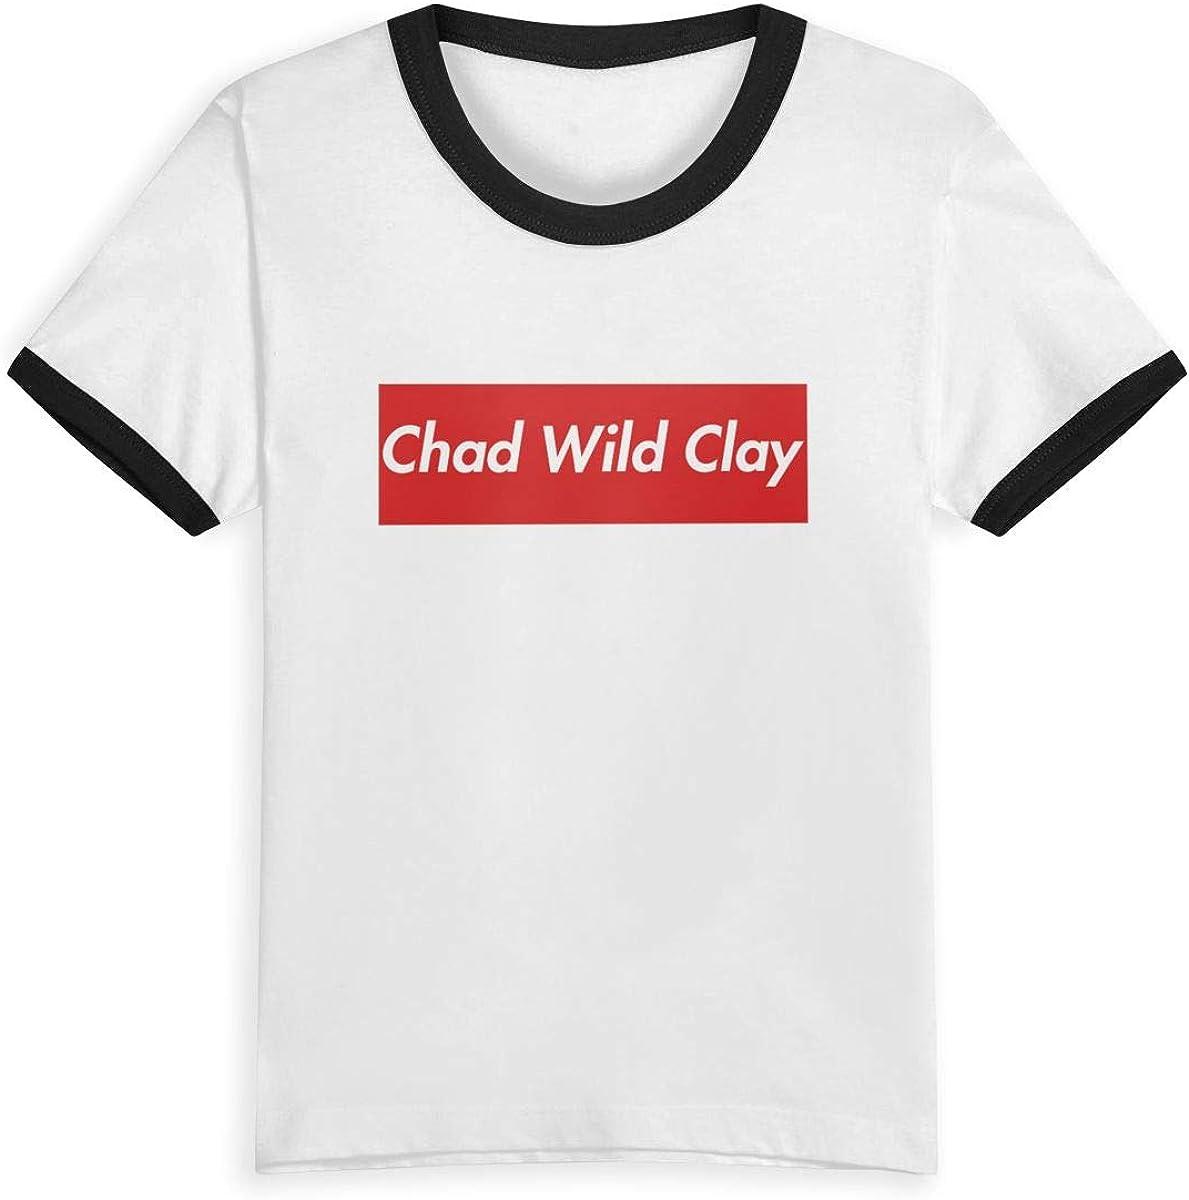 EVAGIBBONS Chad Wild Clay Child Leisure Cute Fashion Life T Shirt